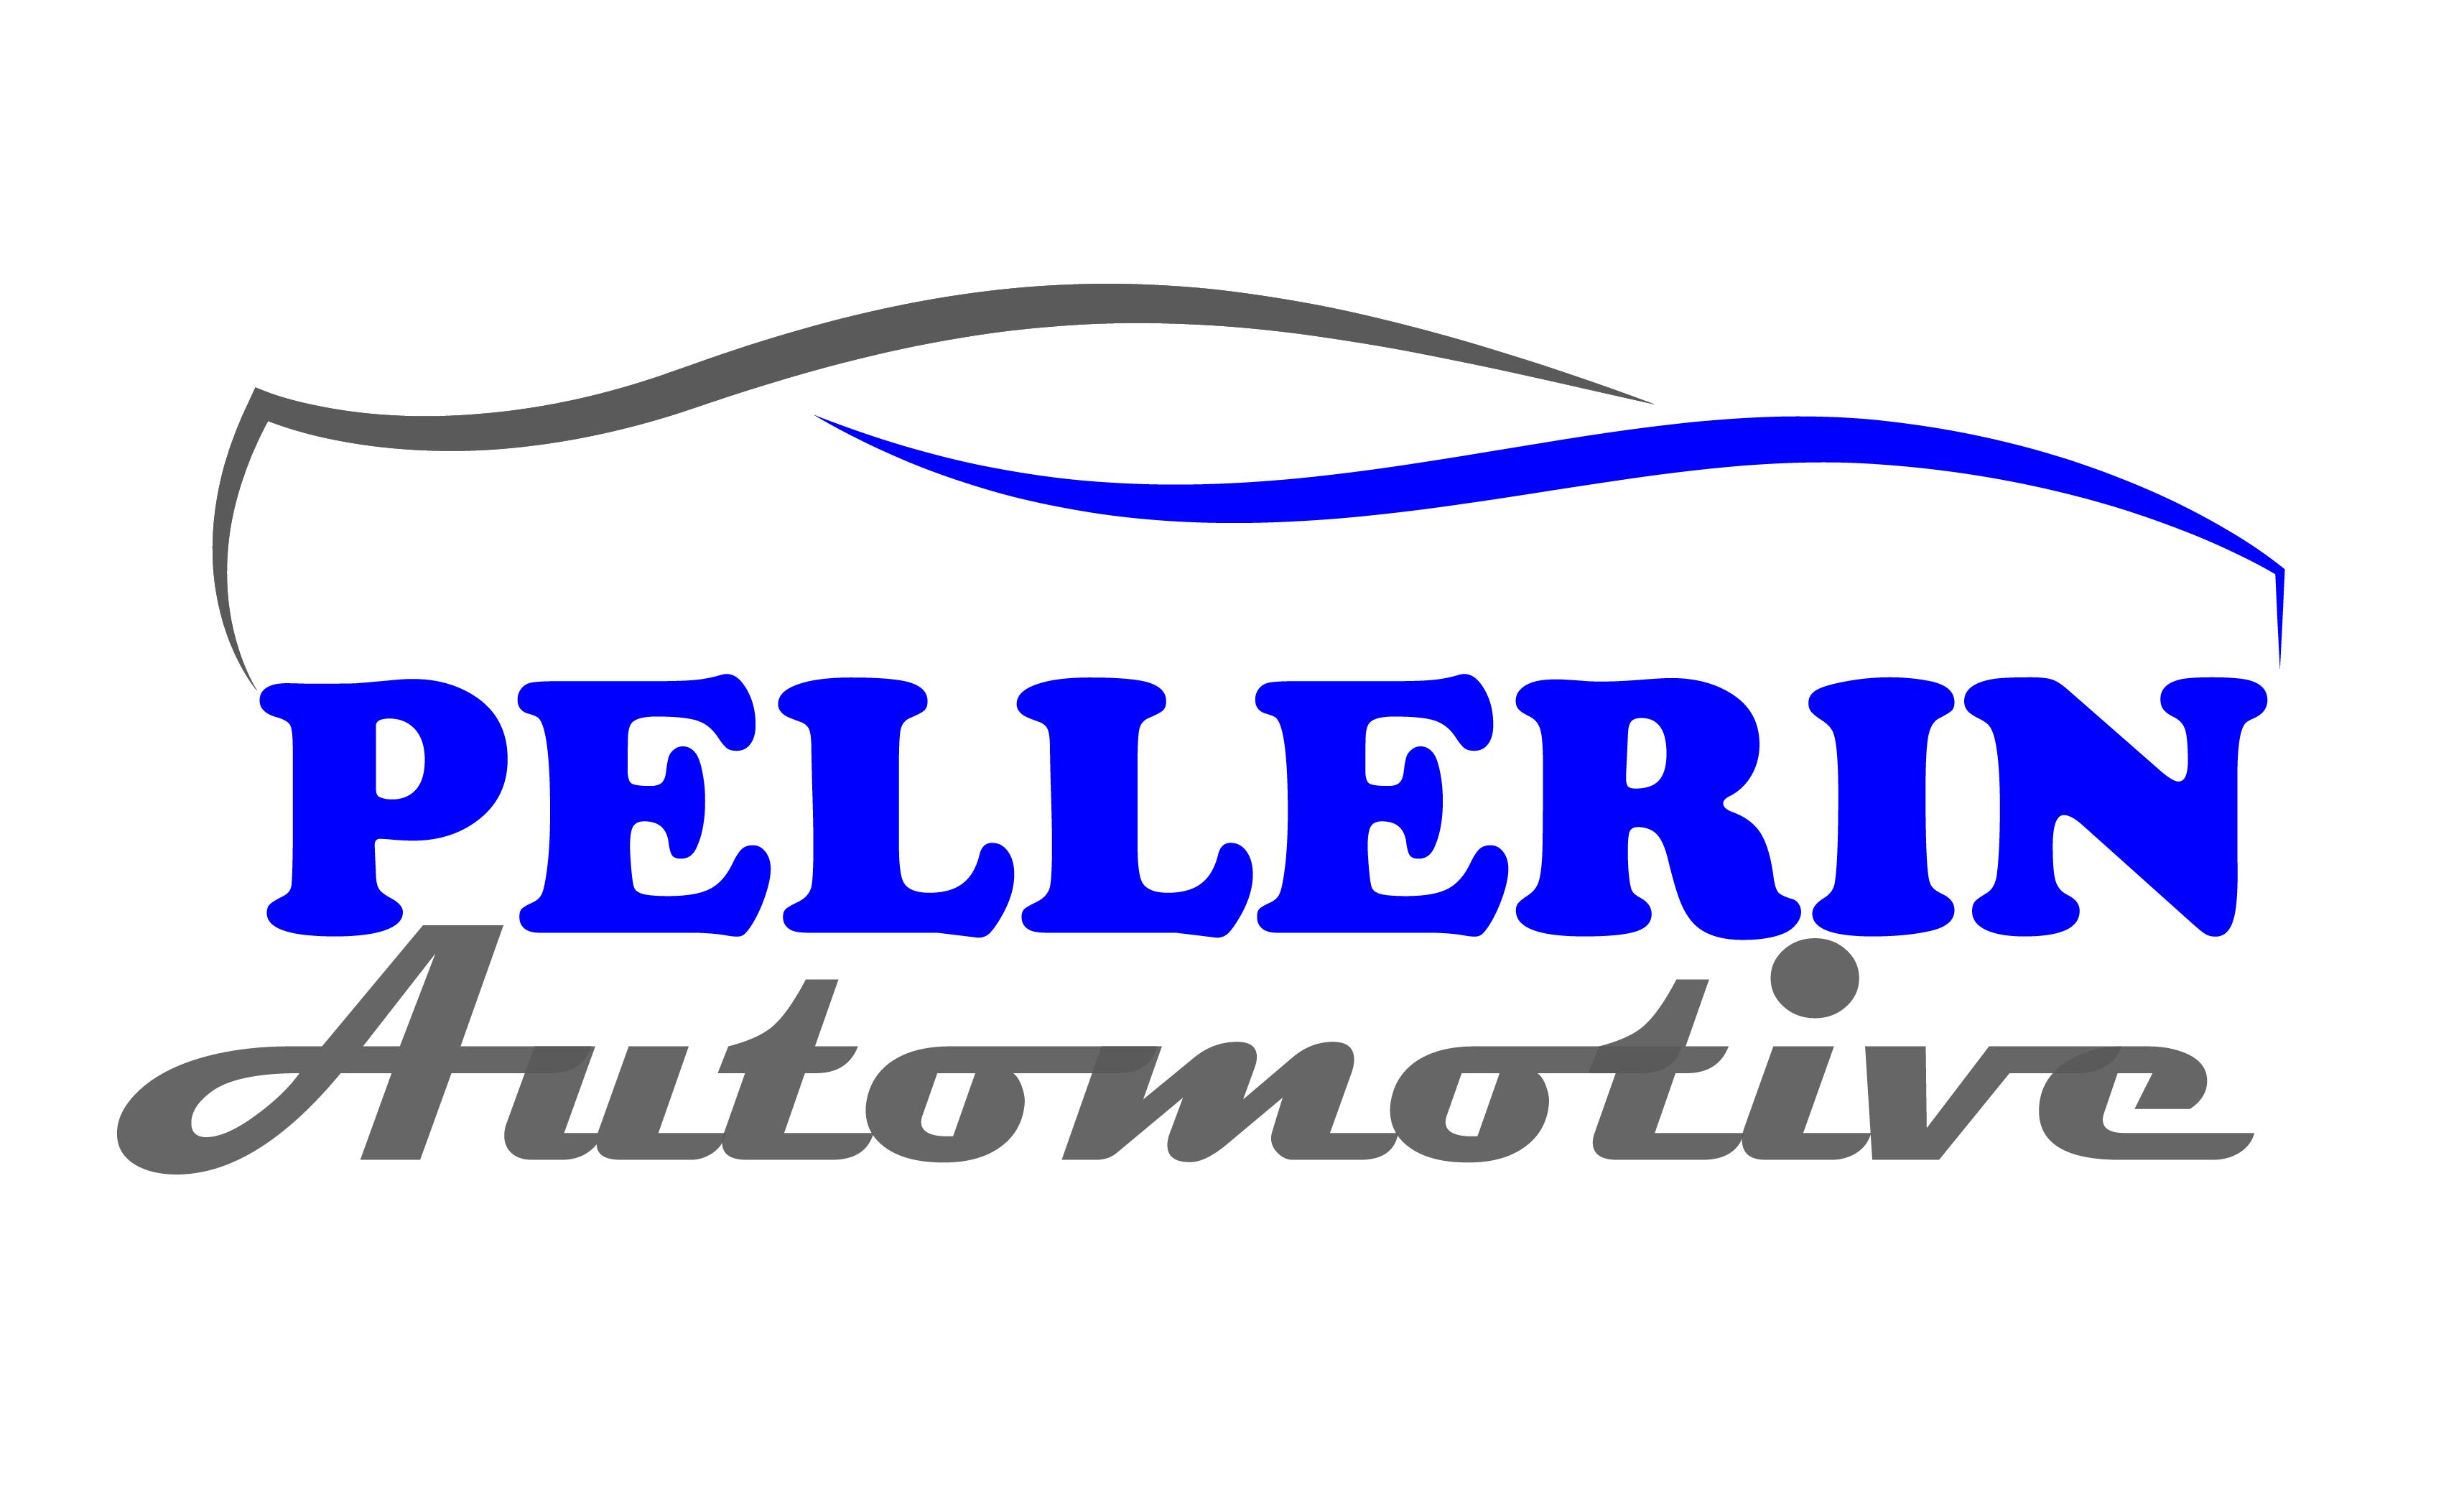 Pellerin Automotive Logo